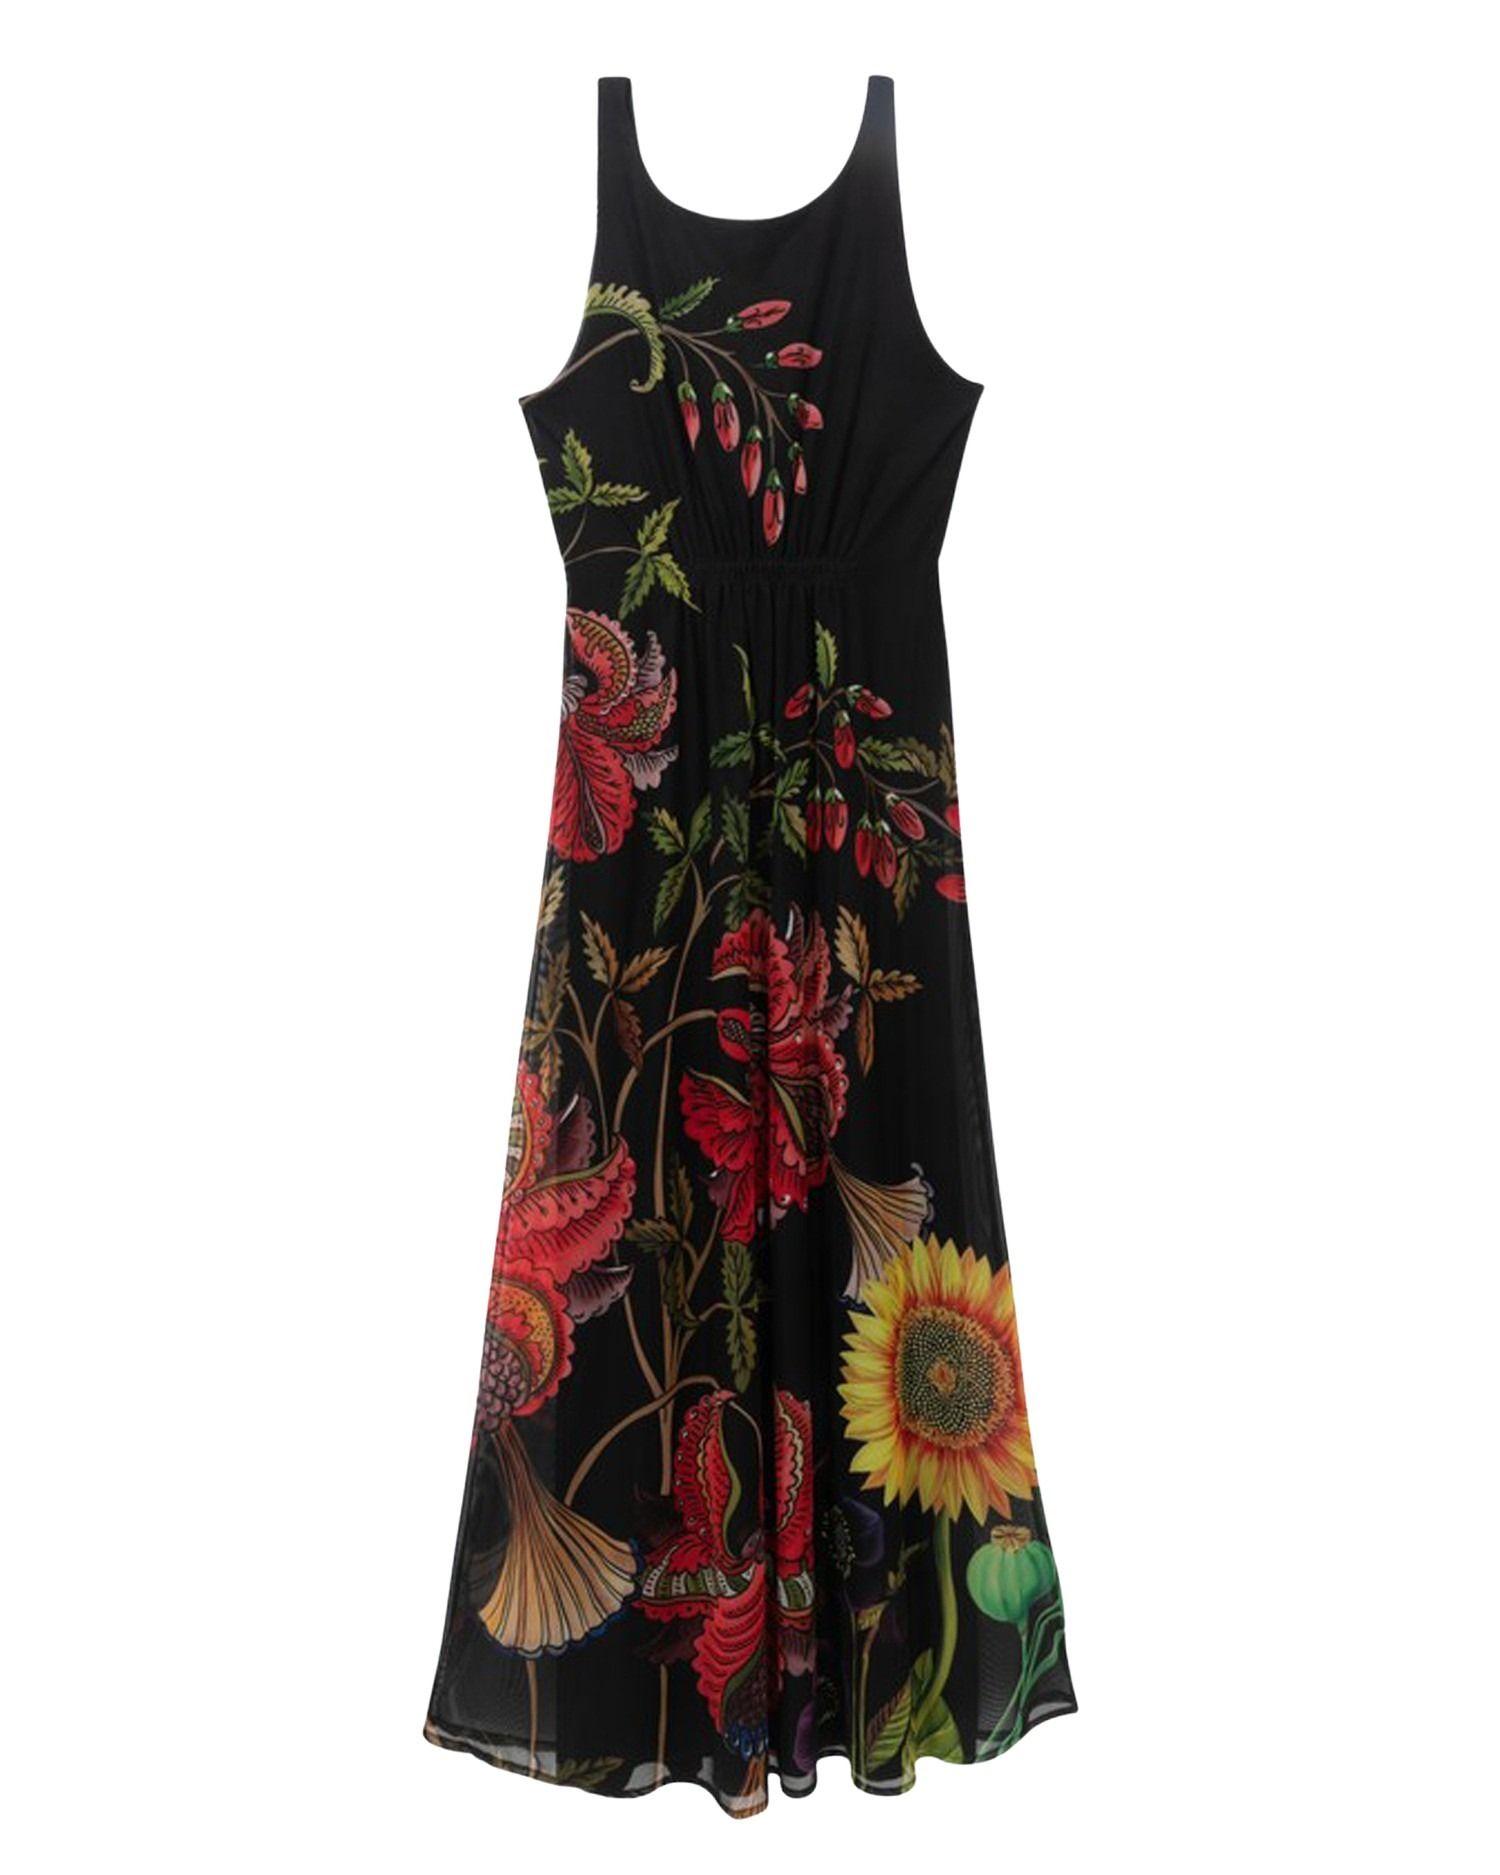 Desigual Dresses DESIGUAL WOMEN'S BLACK POLYESTER DRESS